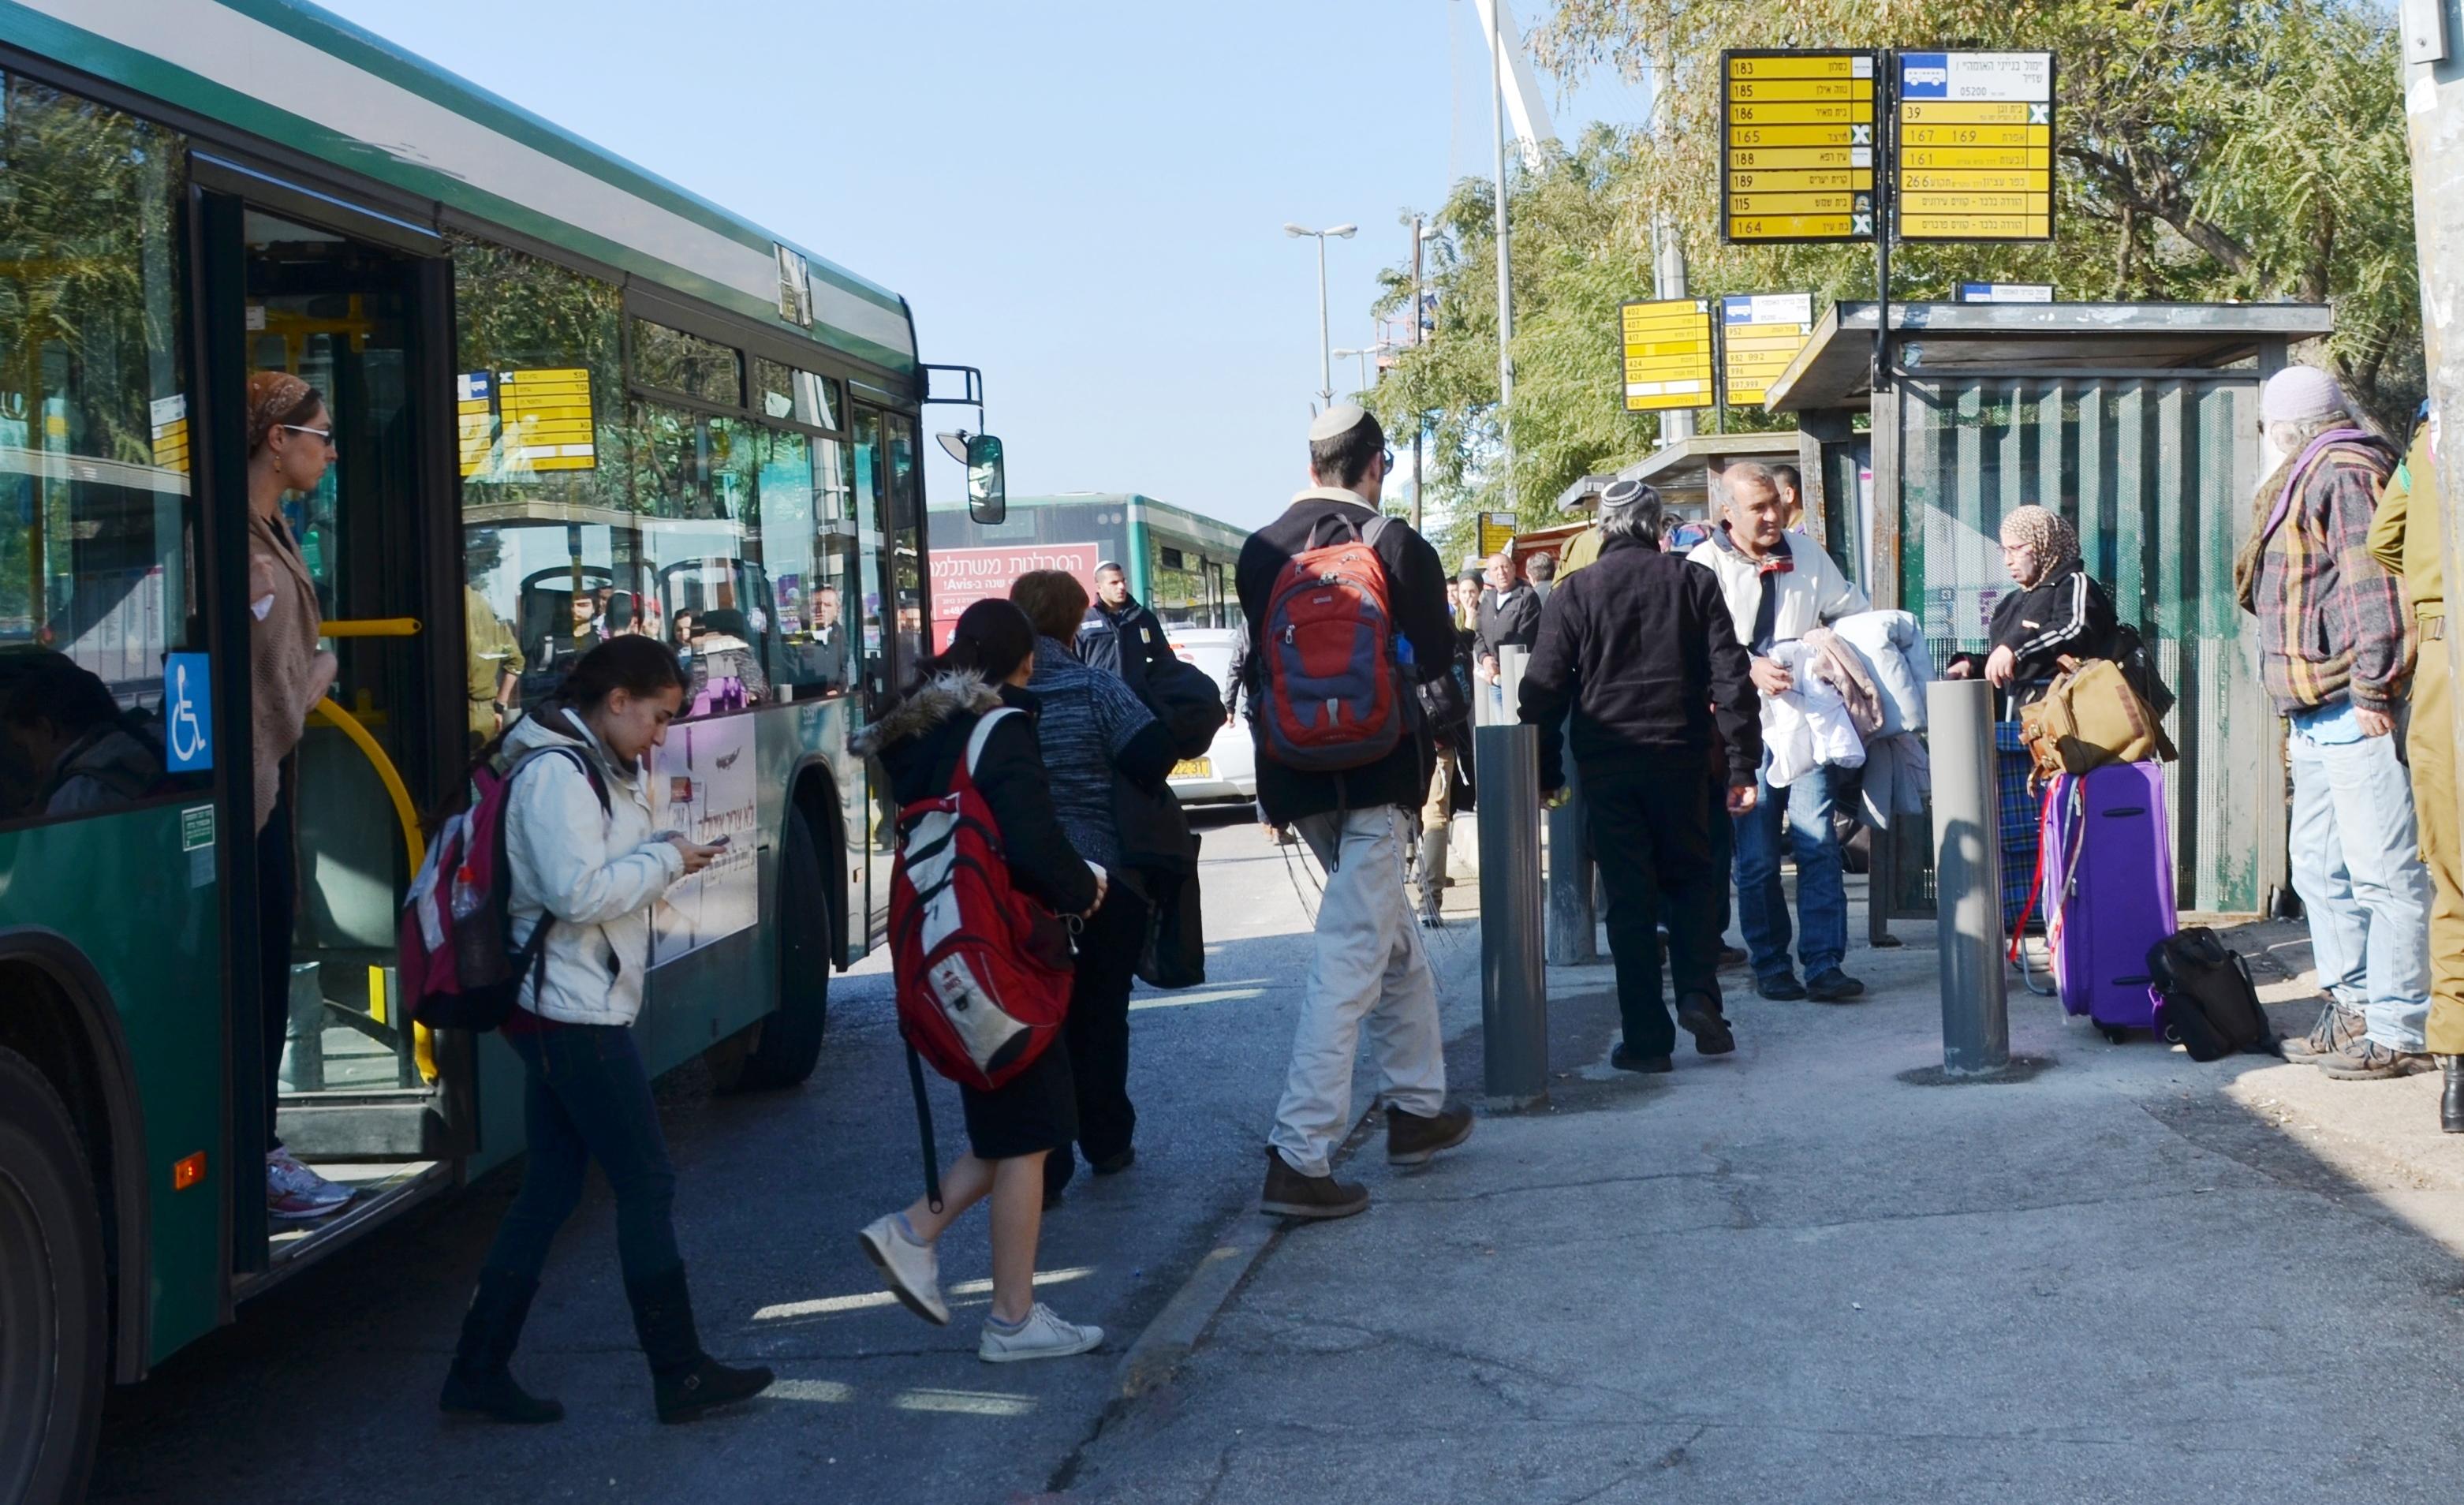 Bus stop near main bus station